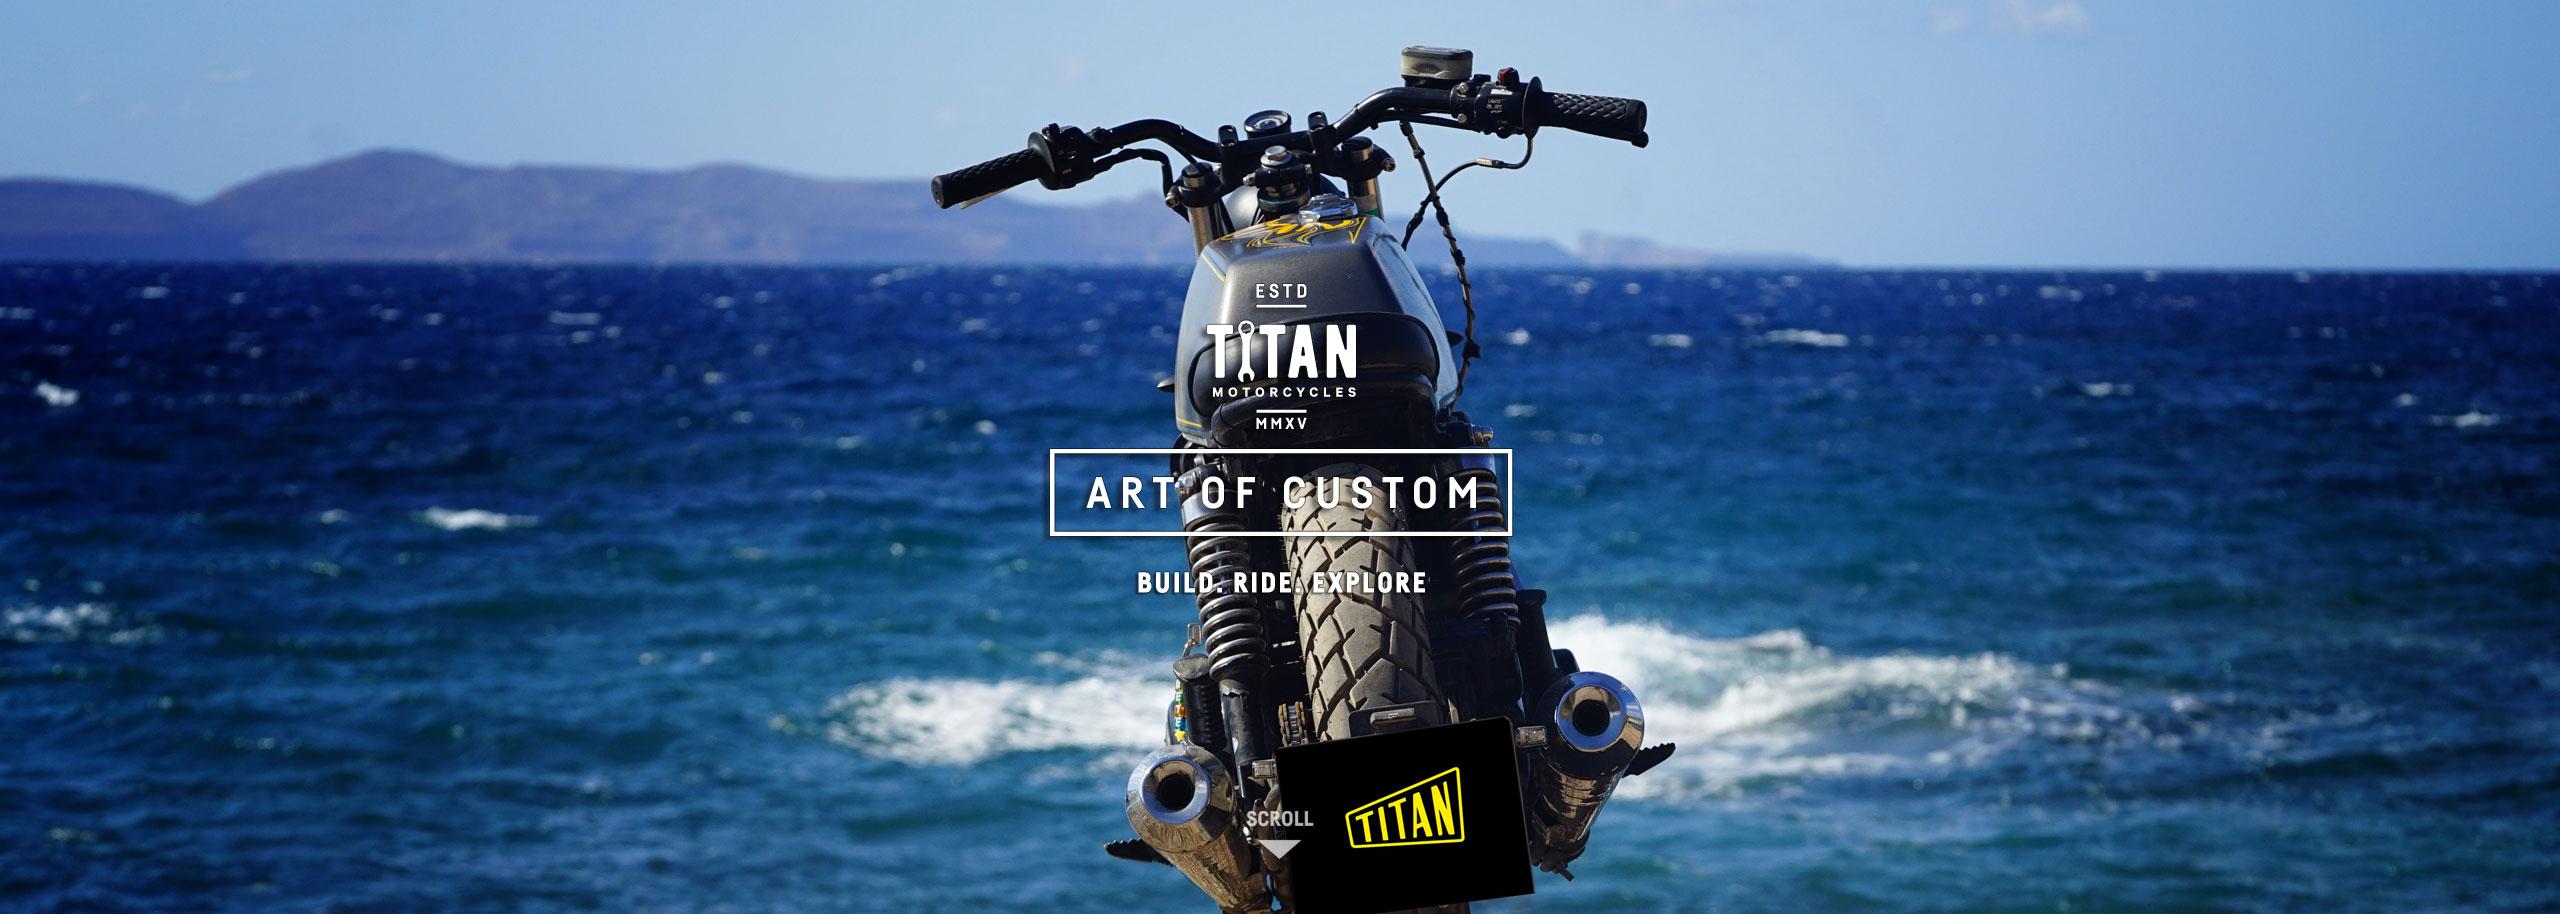 01_TITAN-Greek_Yamaha-Umbau-XS-500_Cafe-Racer-Graz-Motorrad-Umbau-Austria-Vintage_Custom-Bikes_Zweirad_Custom